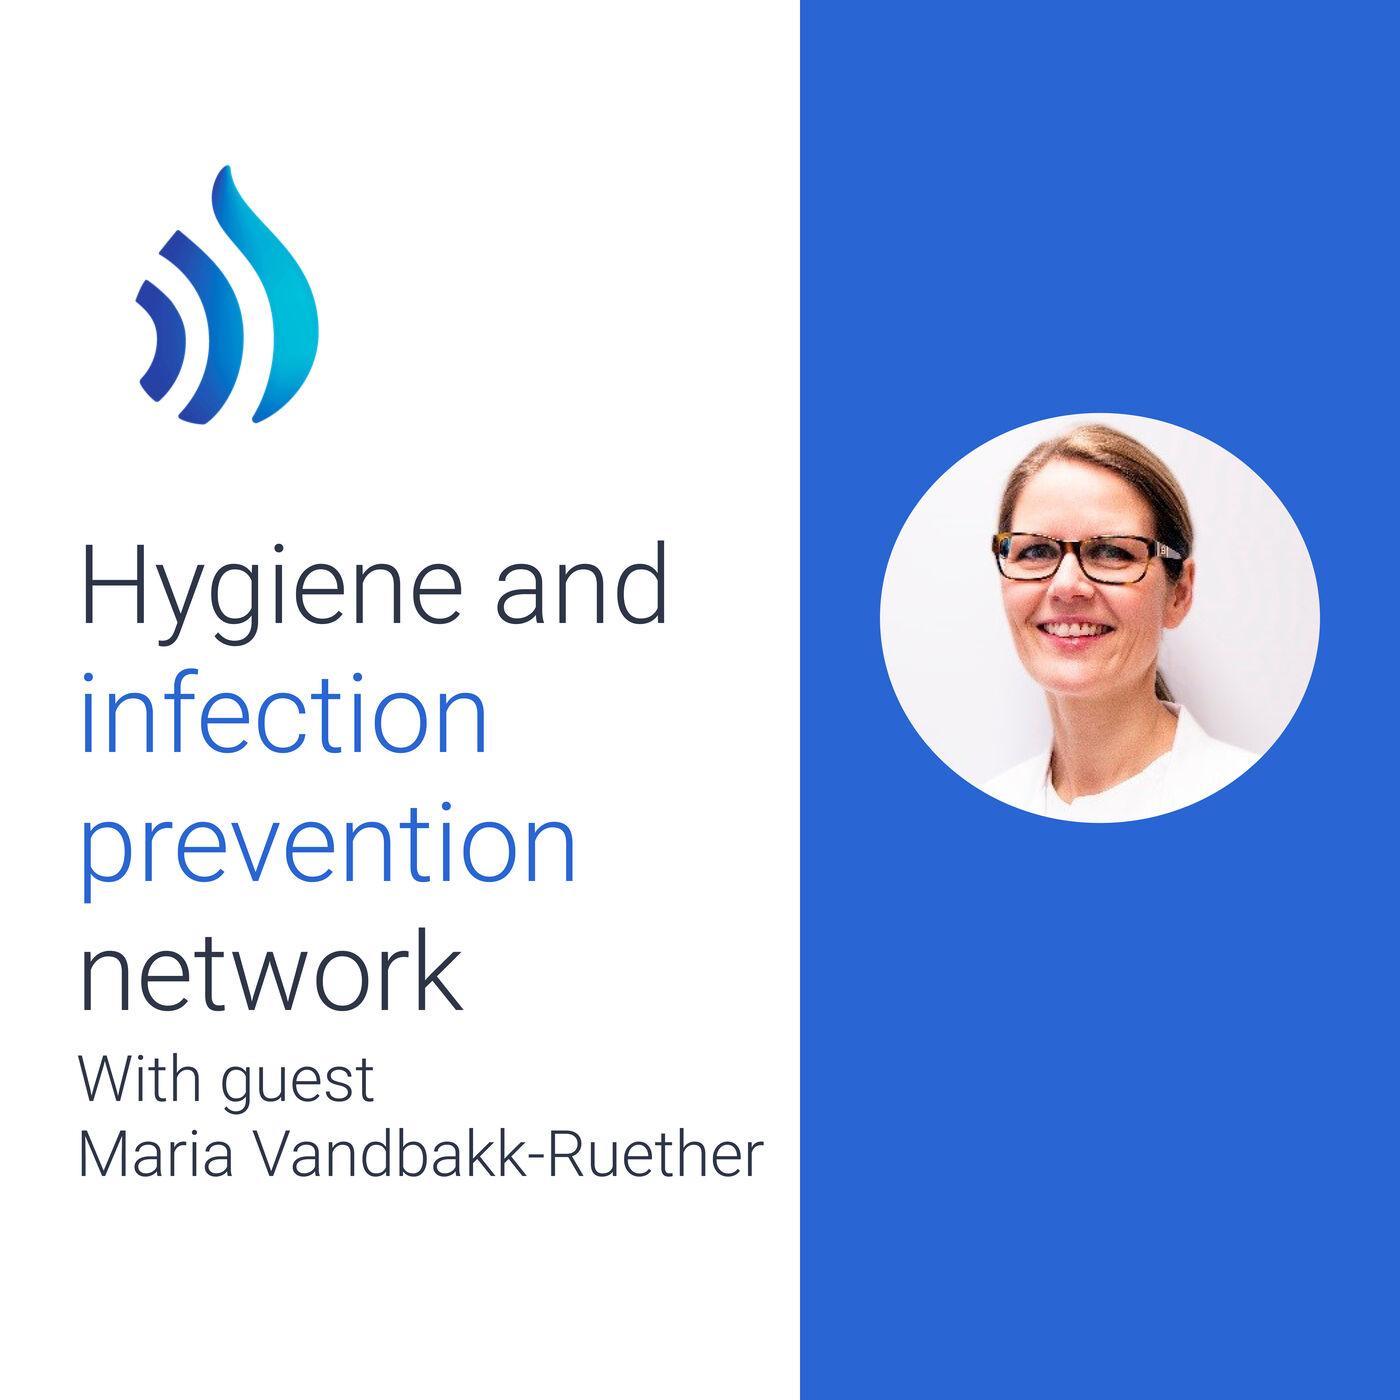 #12 Maria Vandbakk-Ruether on antibiotic stewardship (Norway)